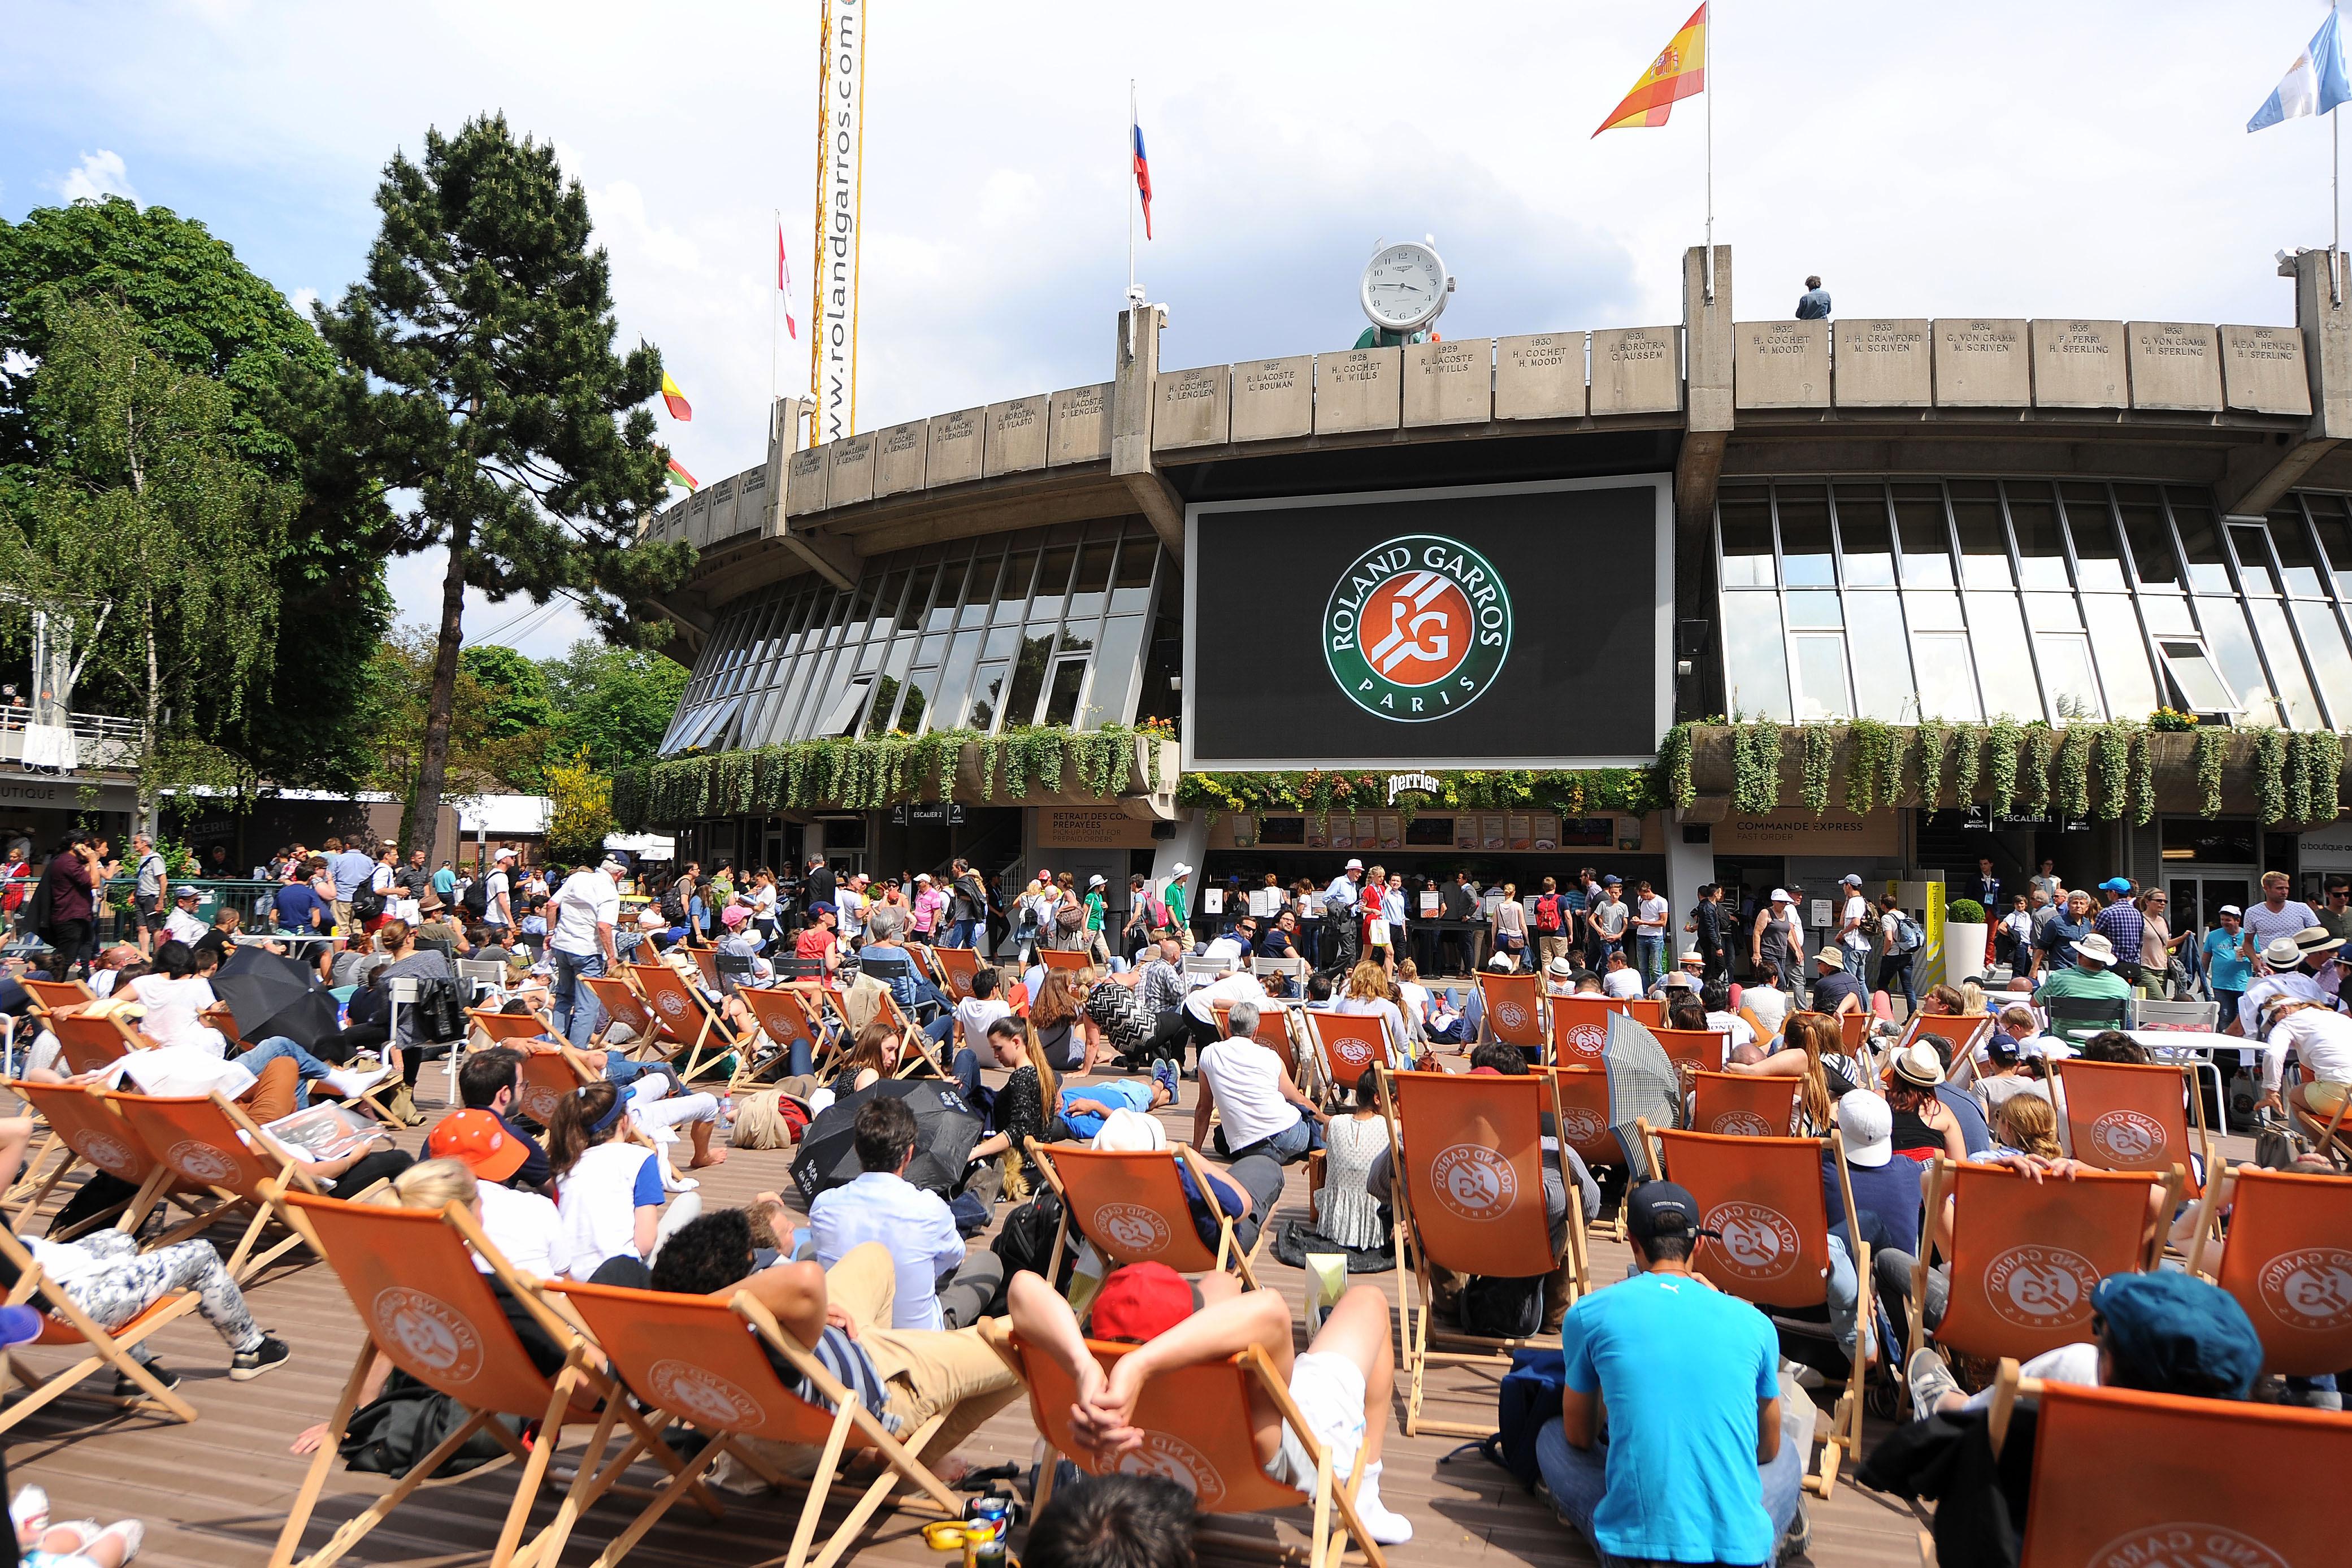 Tennis - Roland-Garros - Roland-Garros : les travaux (encore) interrompus